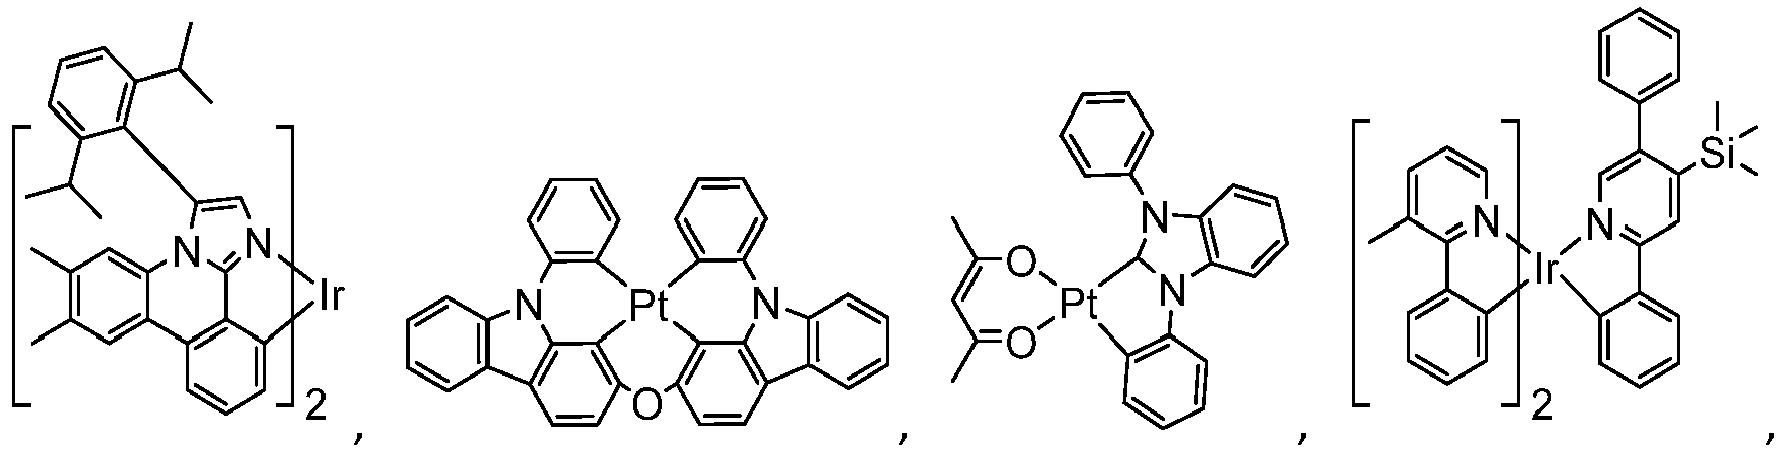 Figure imgb0203